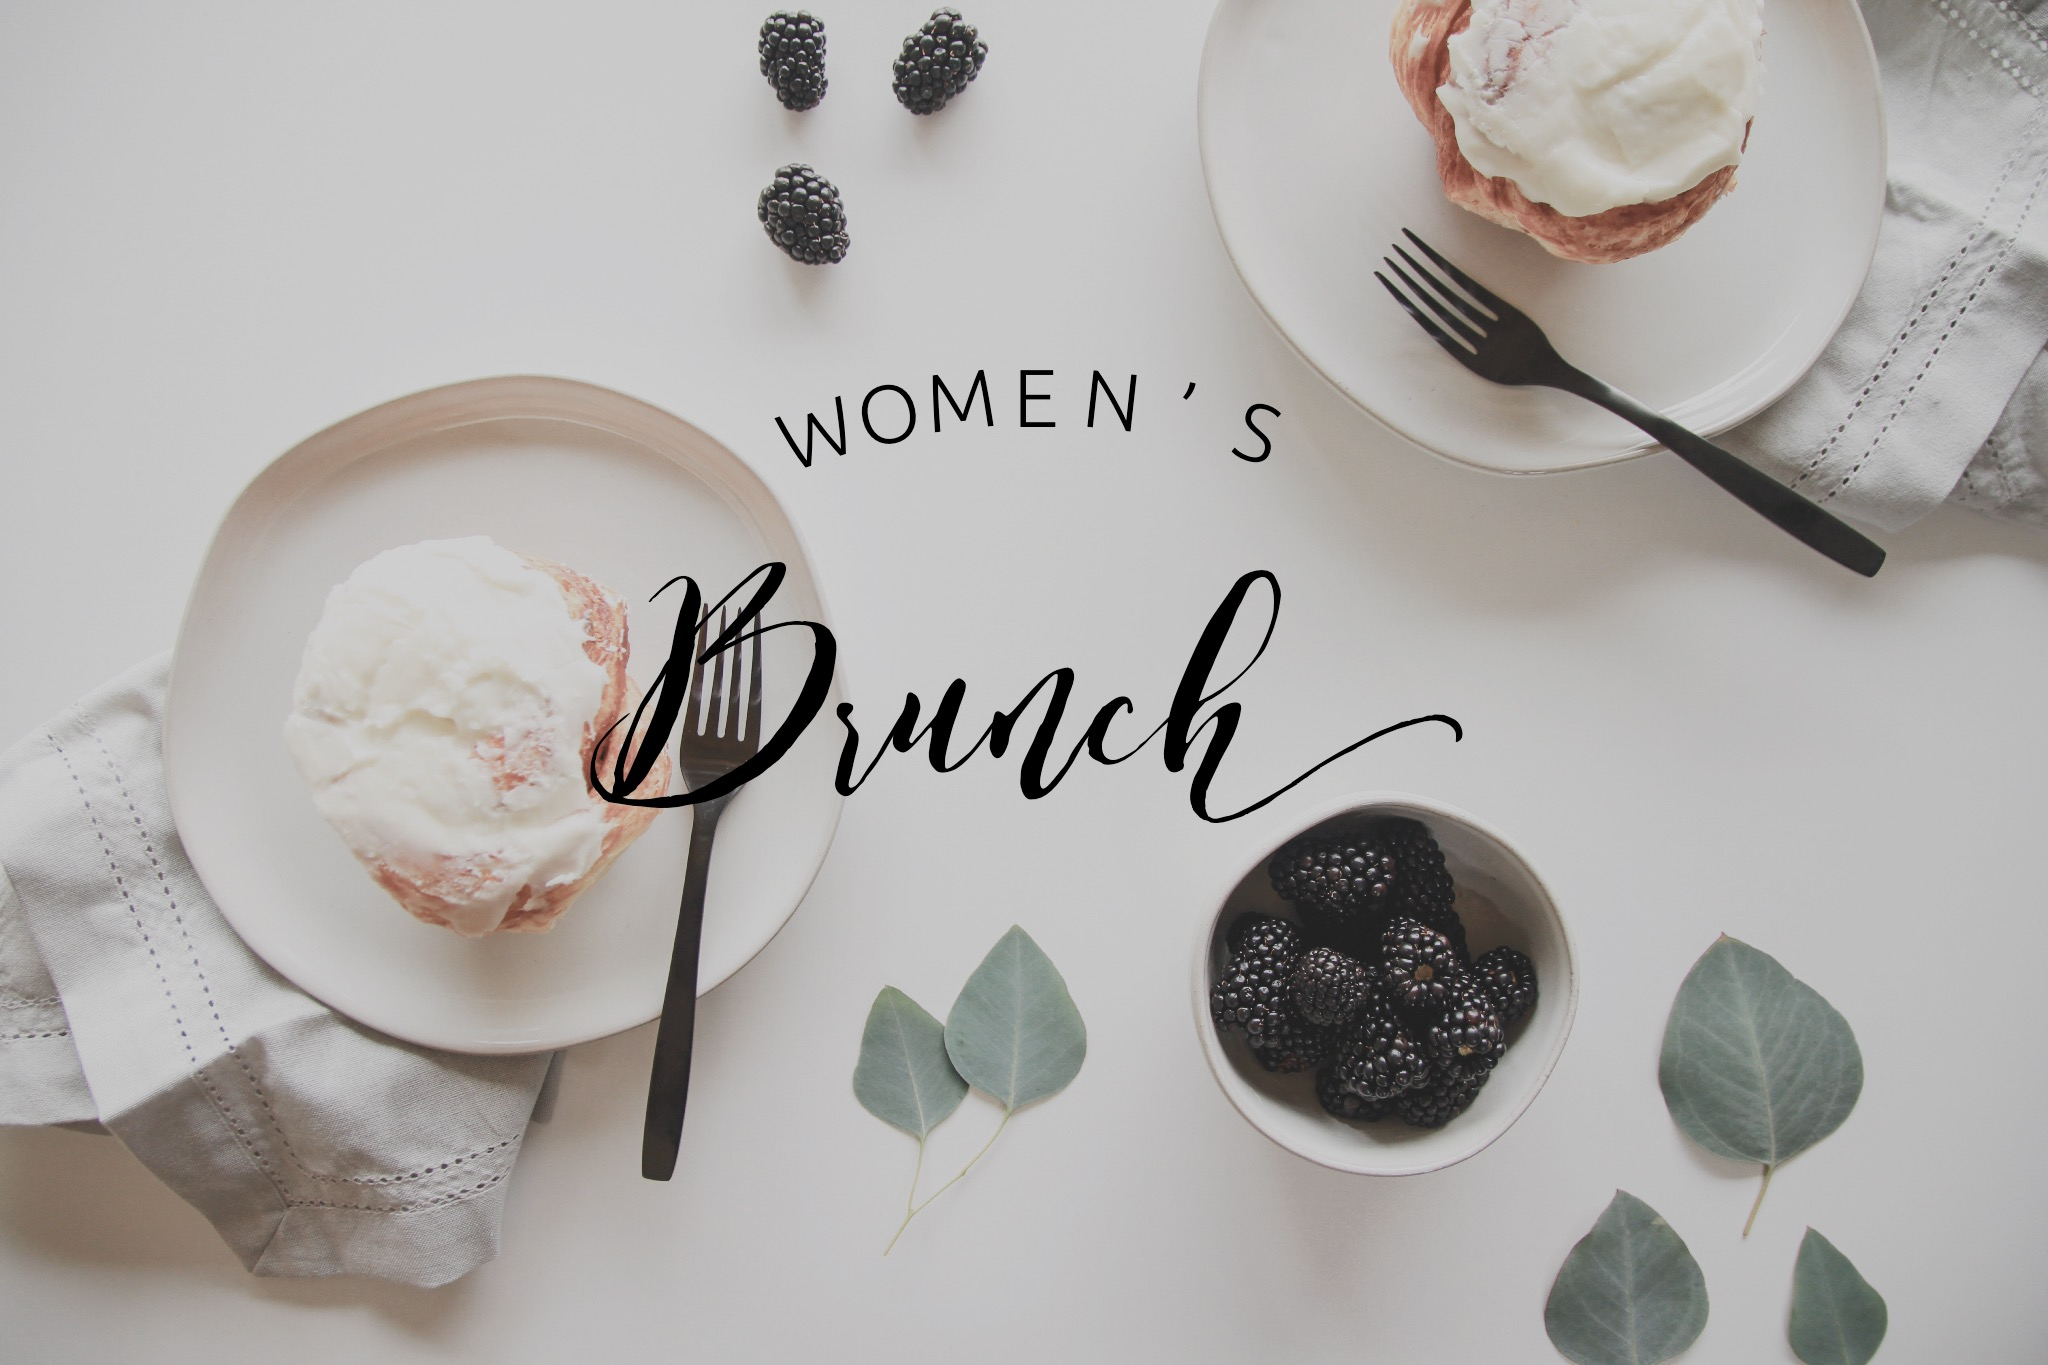 Women's Brunch.jpg